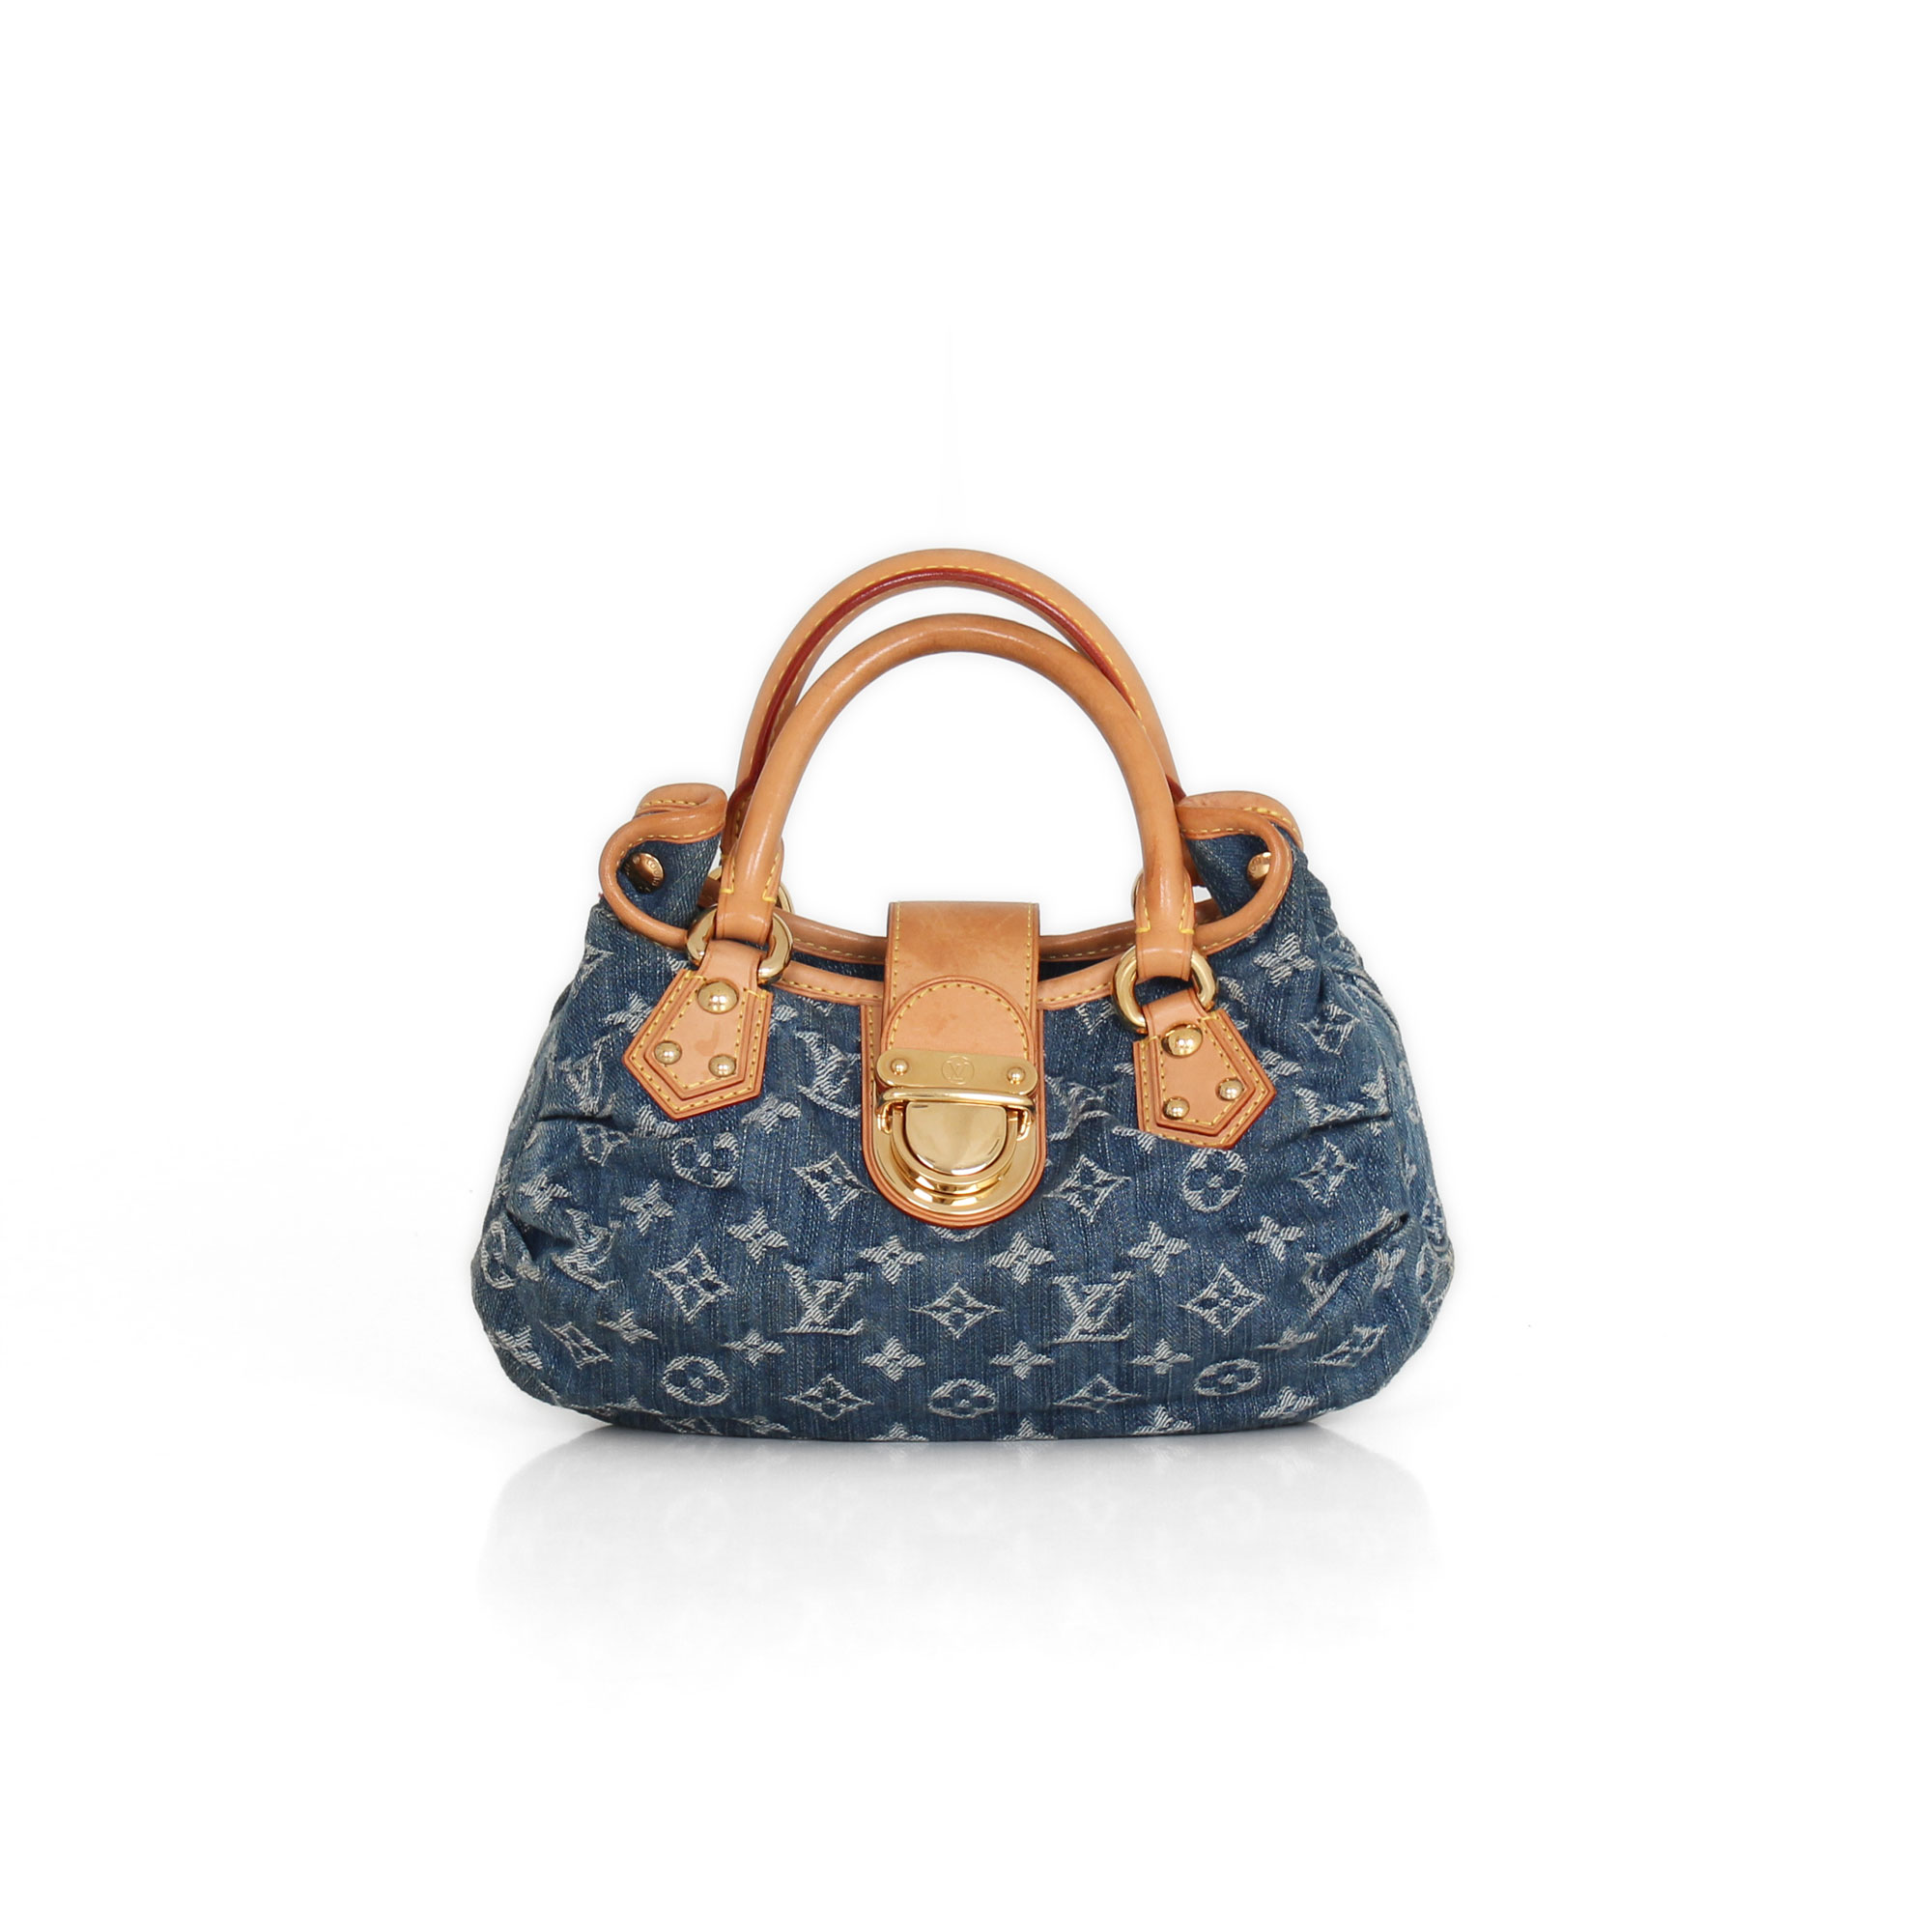 Louis Vuitton Pleaty Denim 1e97159db438a